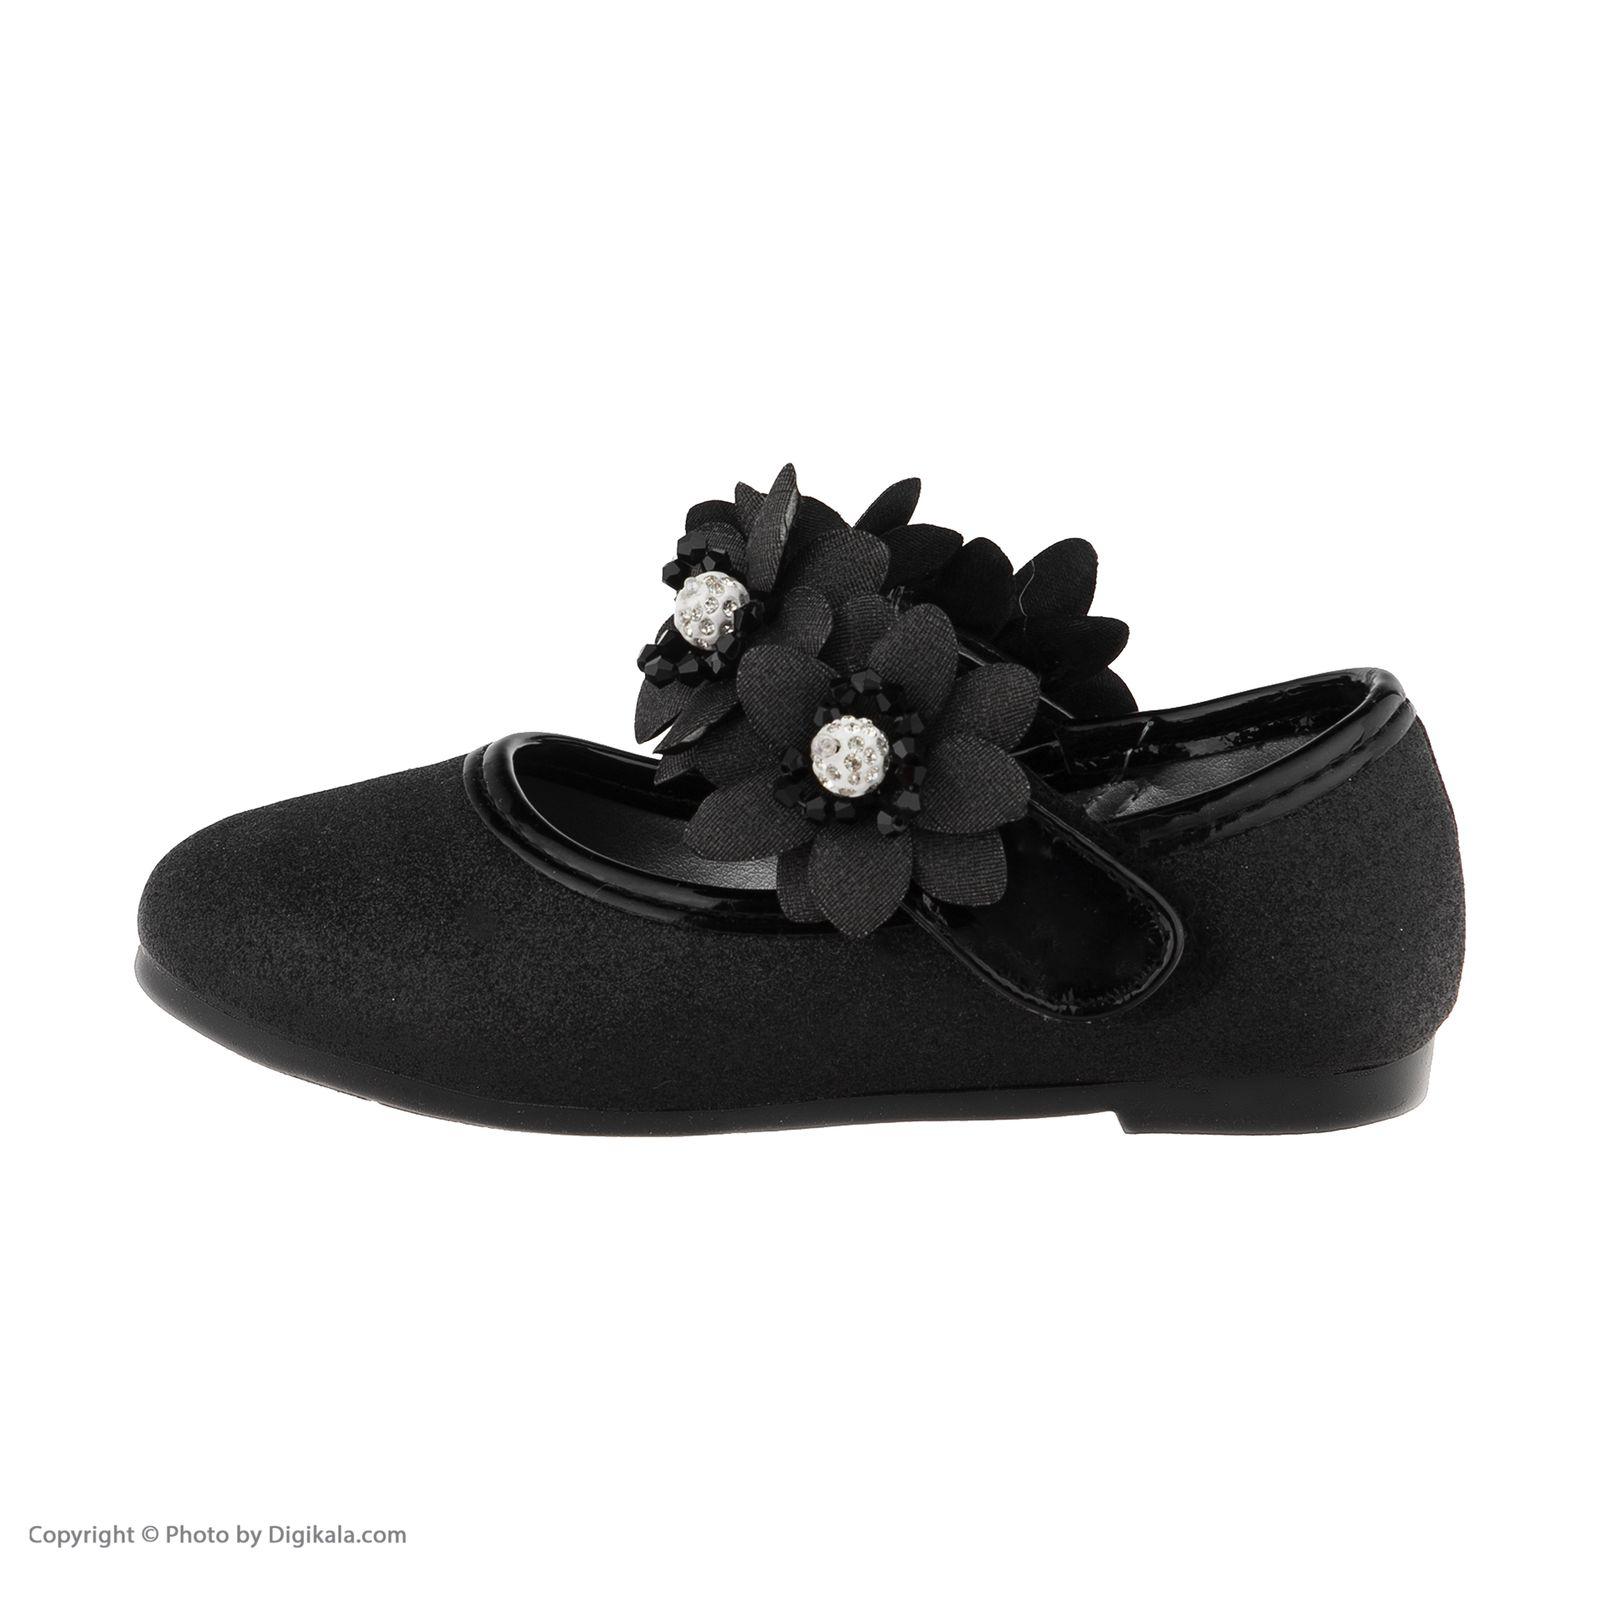 کفش دخترانه کد pa-1036 -  - 1